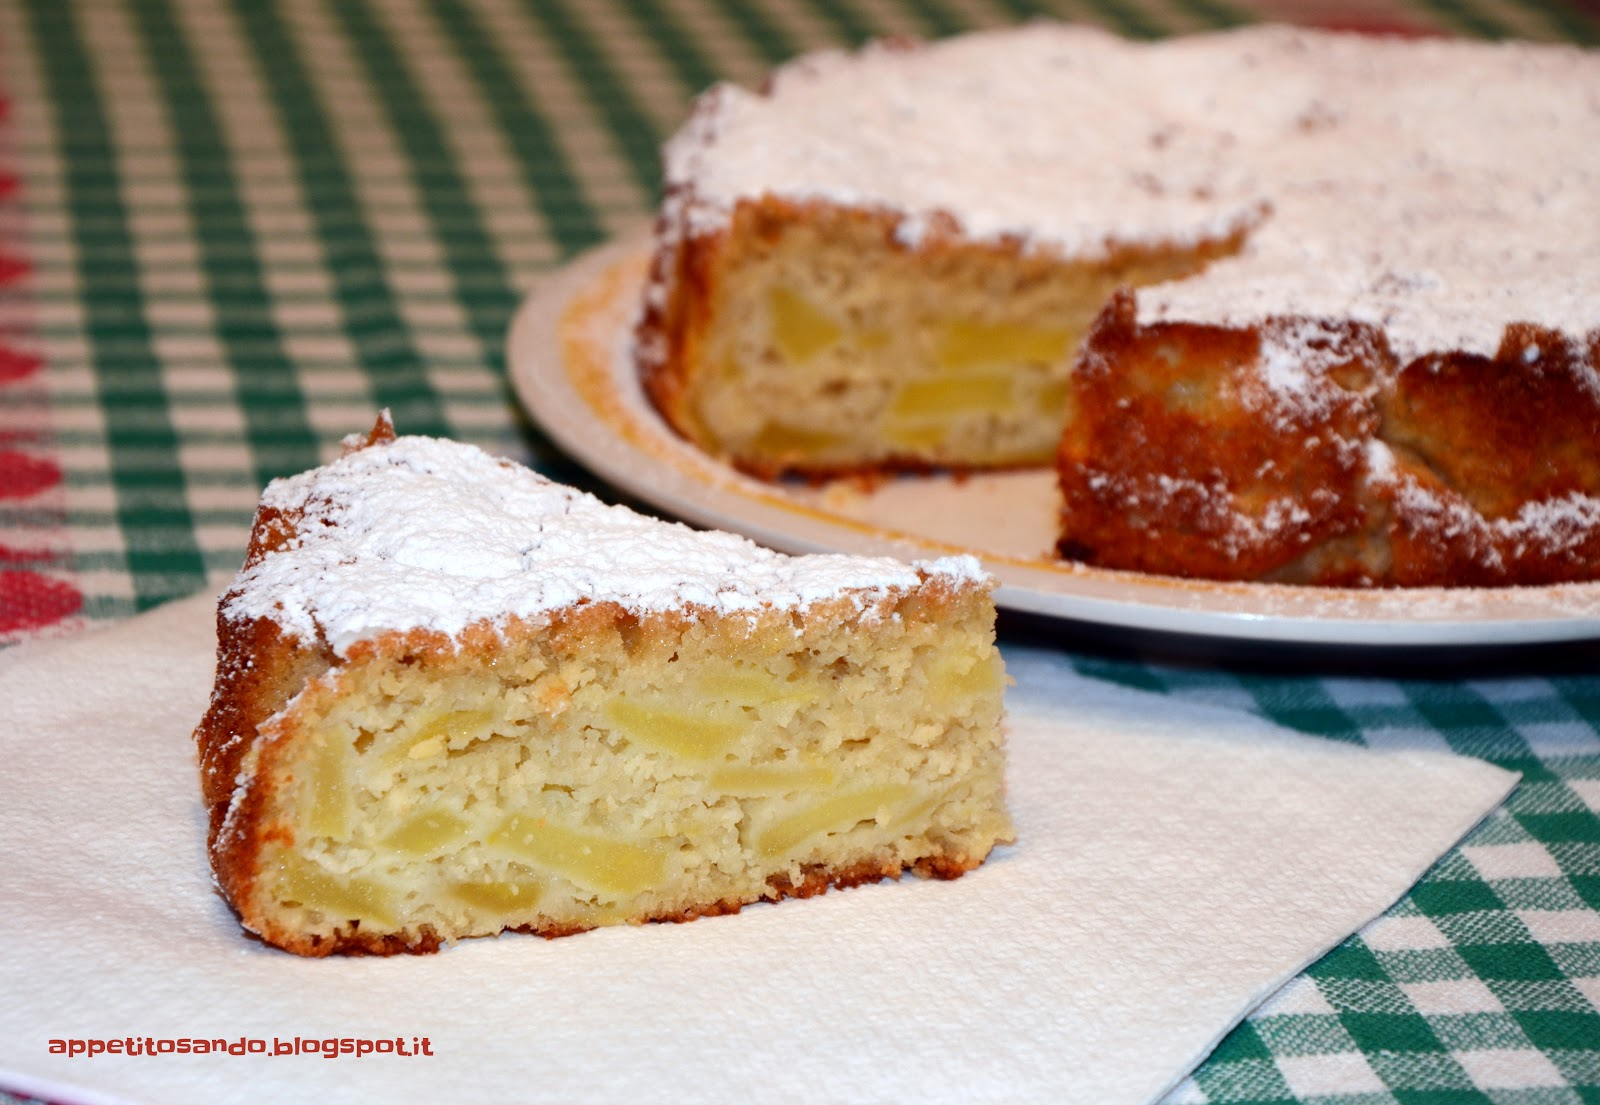 Ricetta Torta Con 1 Uovo.4 Bp Blogspot Com P9aftbxi8aw Ujlae5uh Zi Aaaaaaa